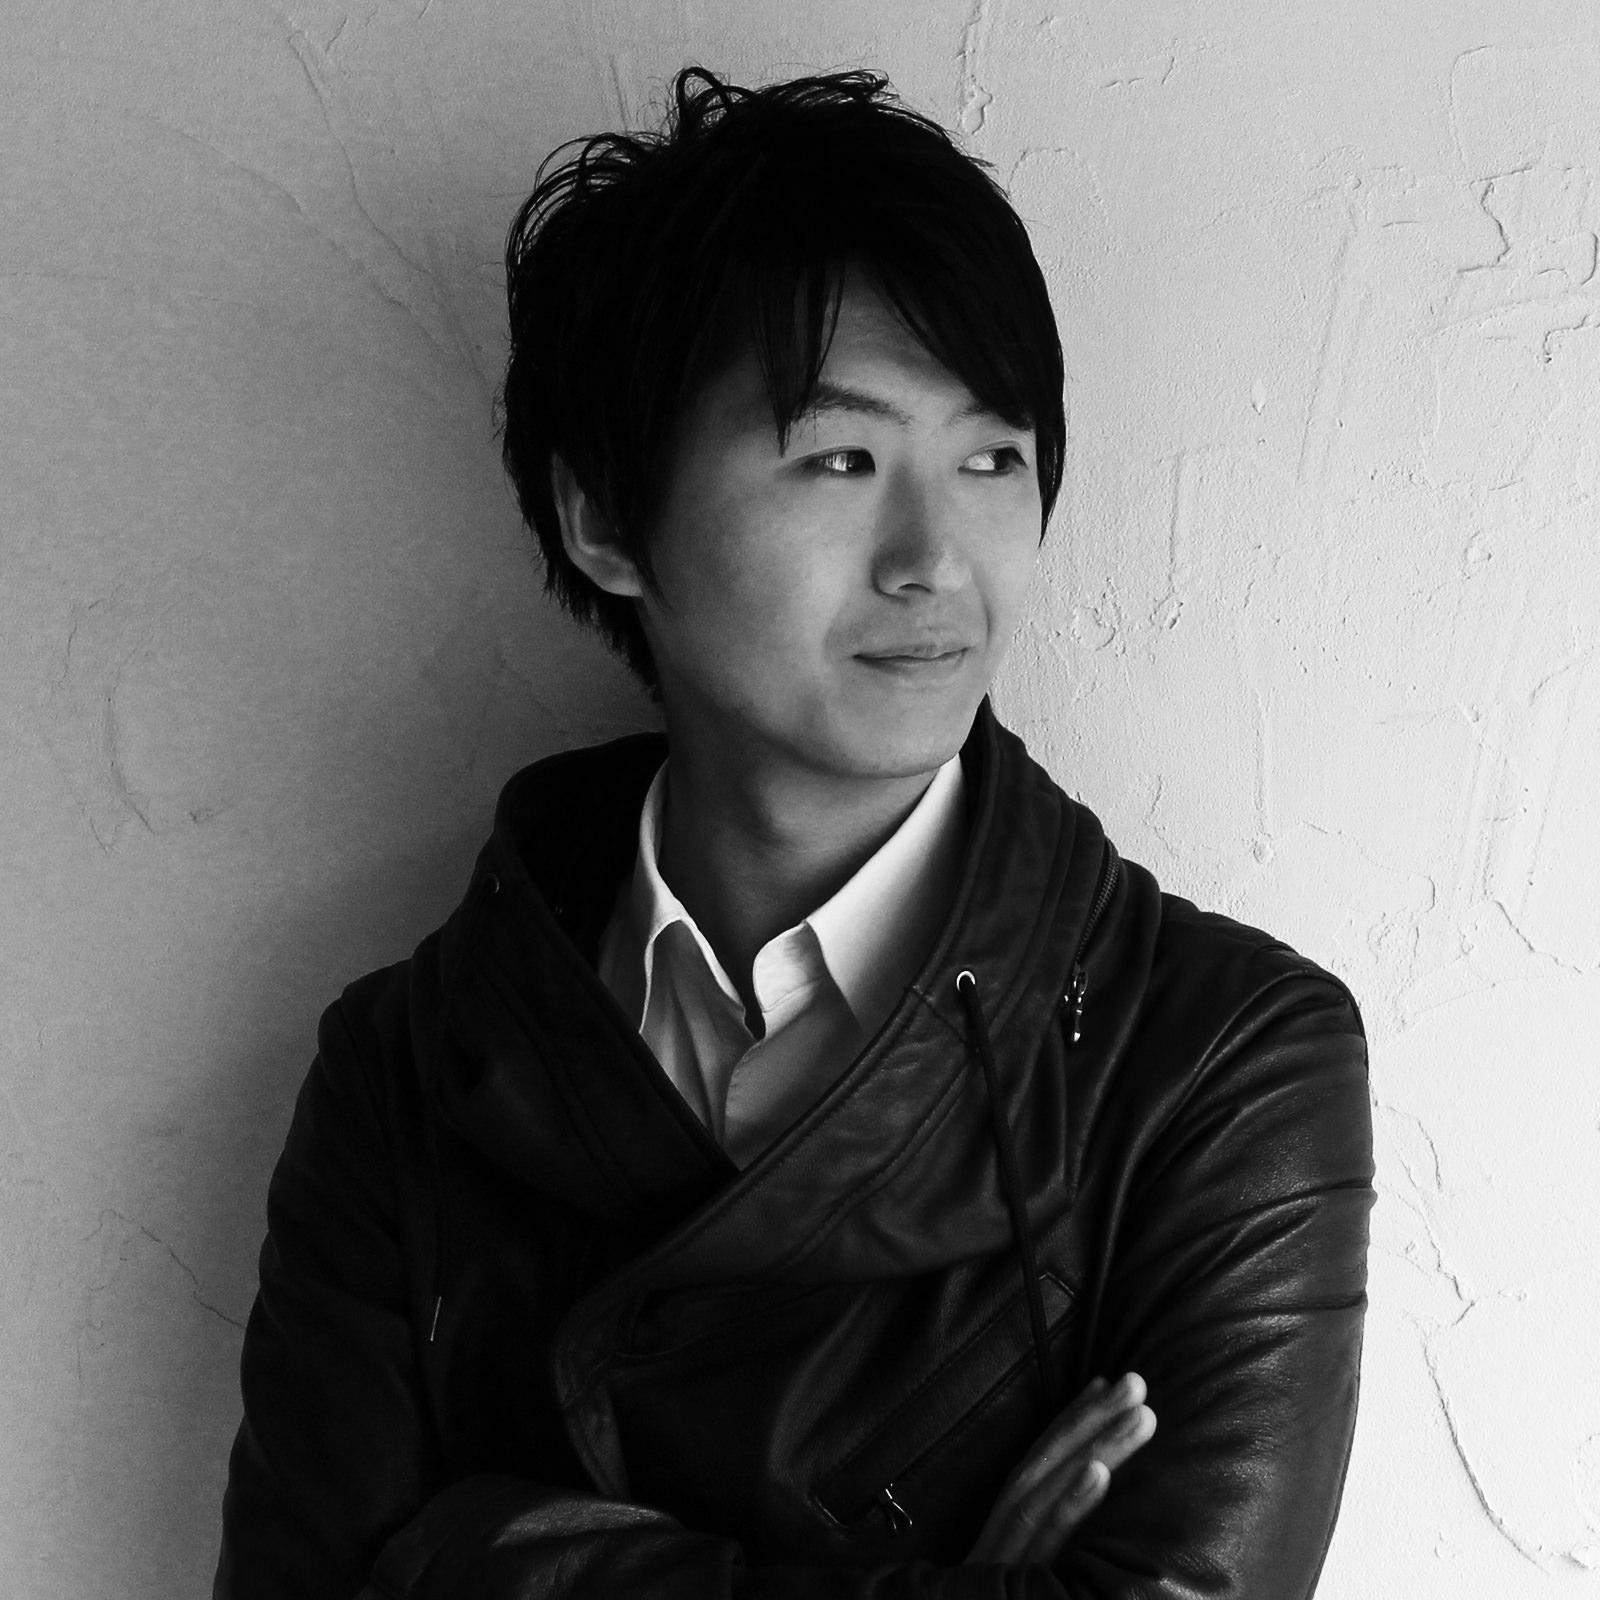 Shunsuke Iseki